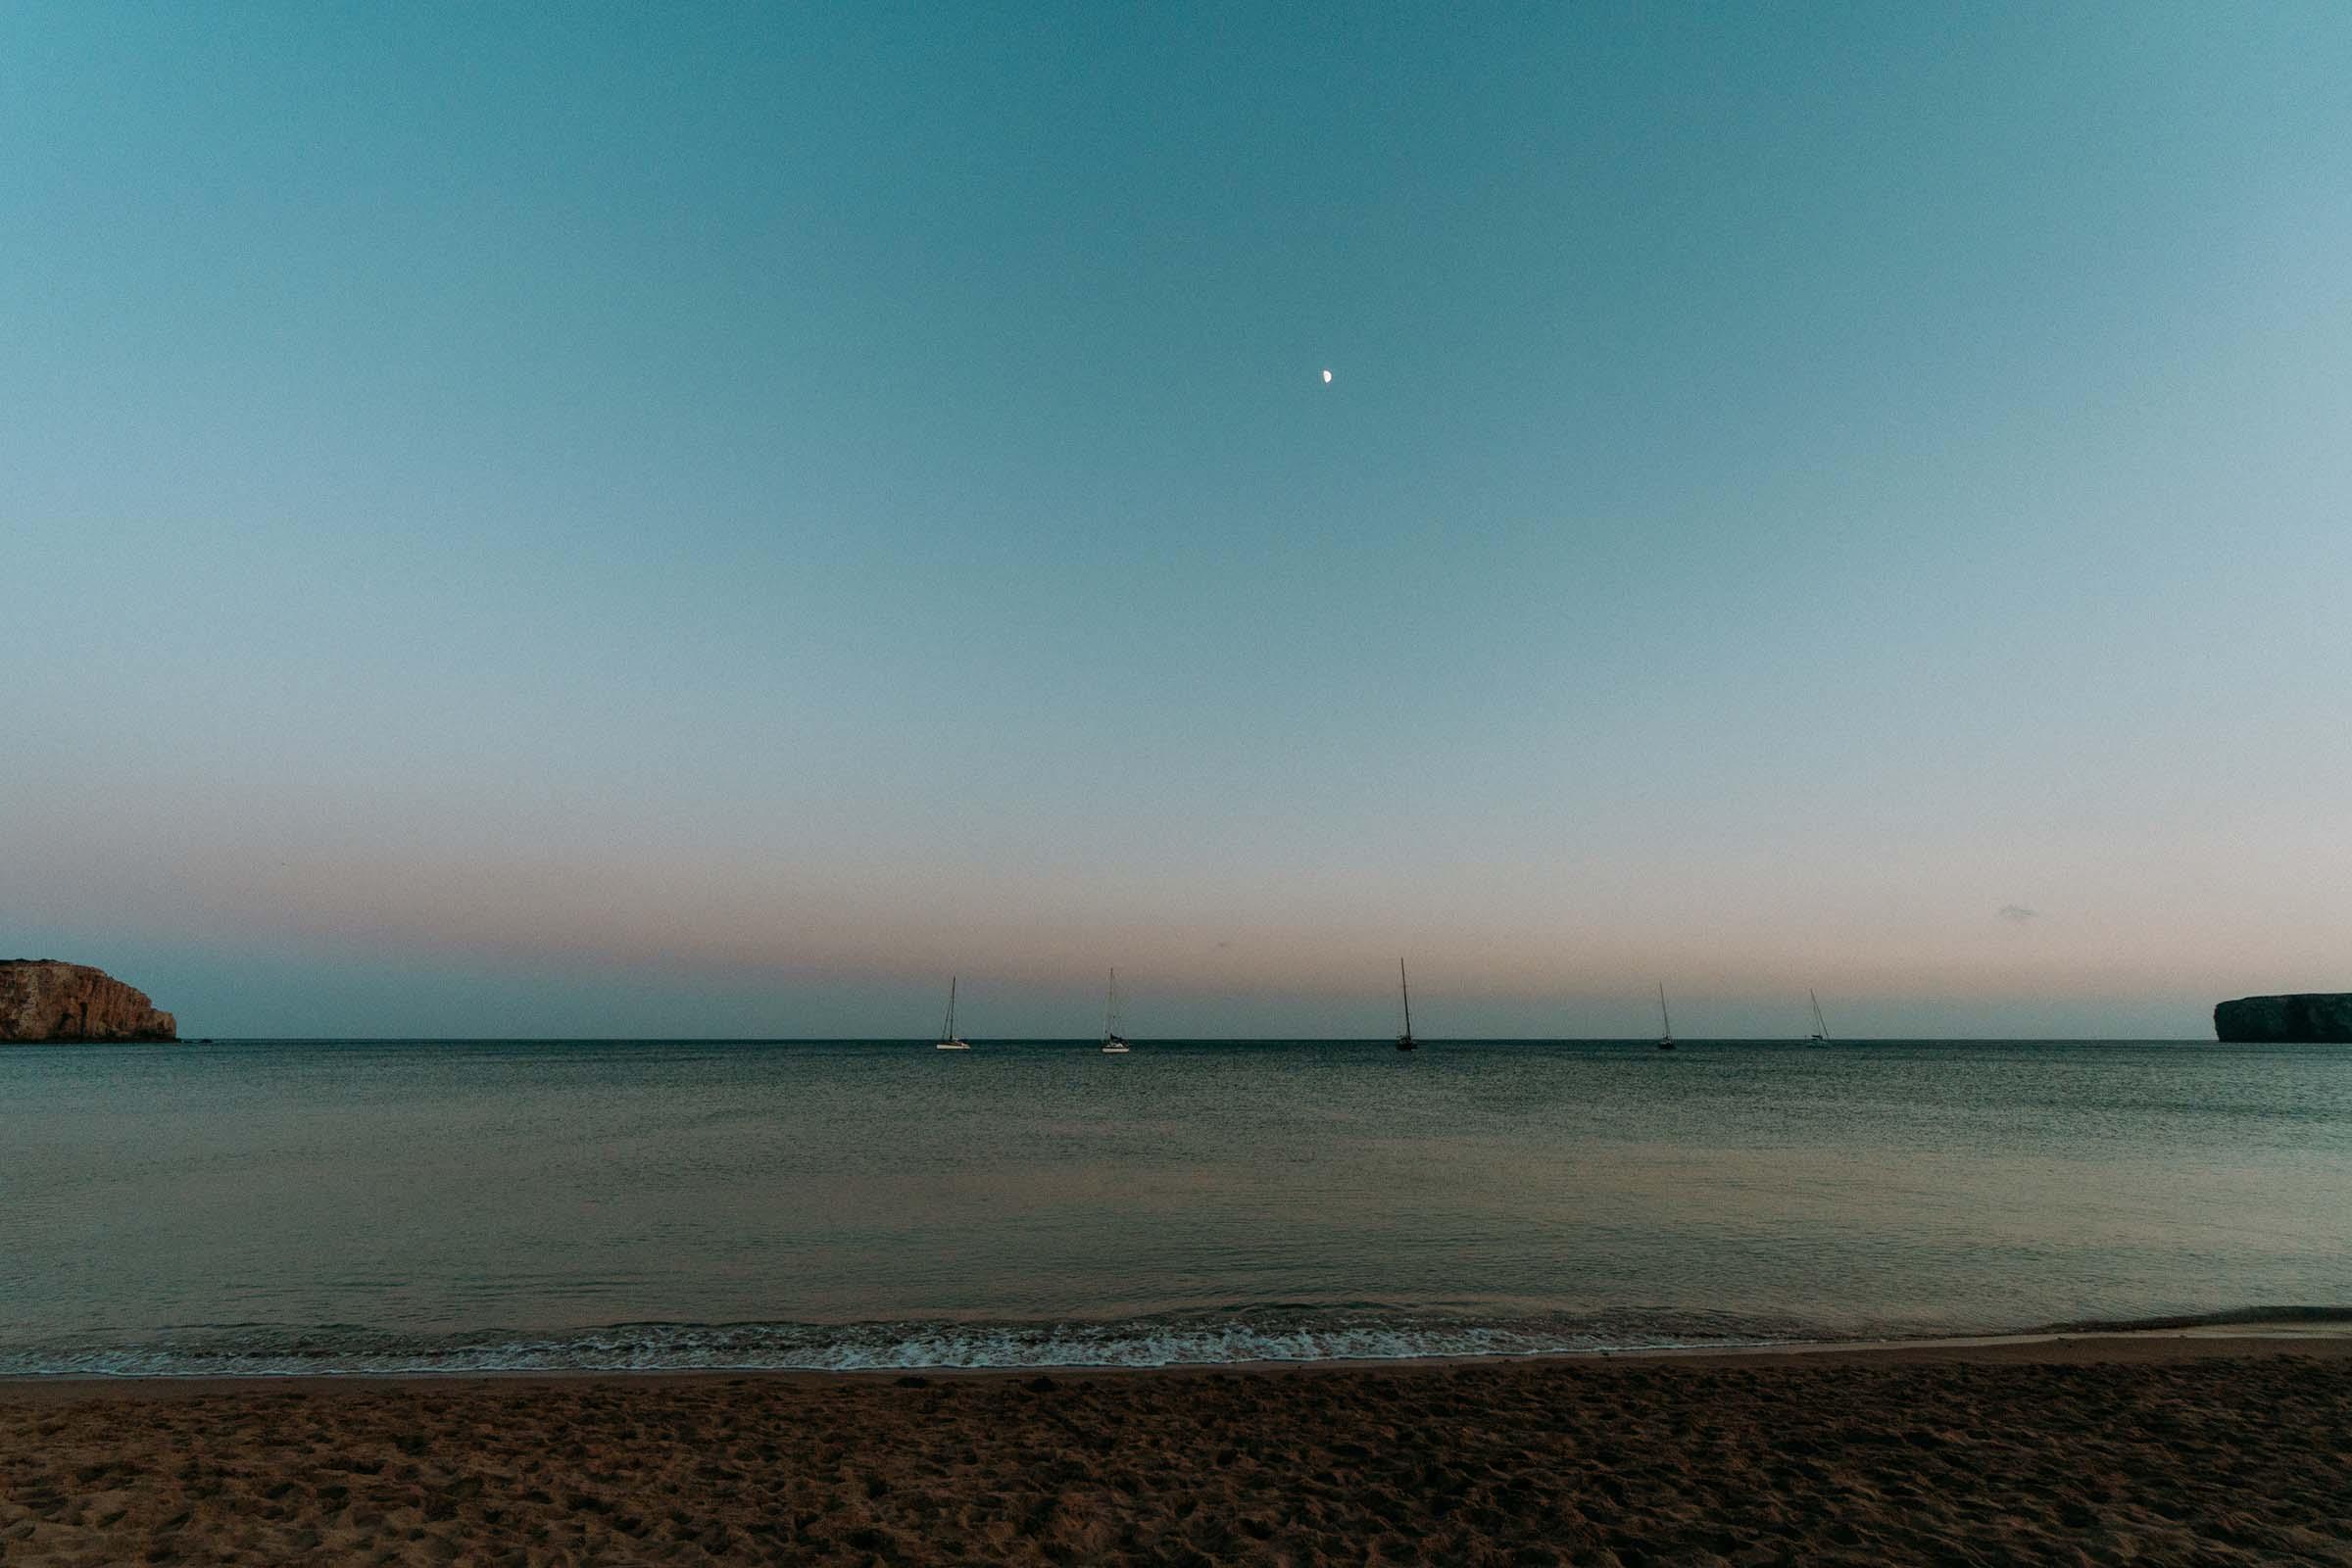 dusk at the beach with boats far away